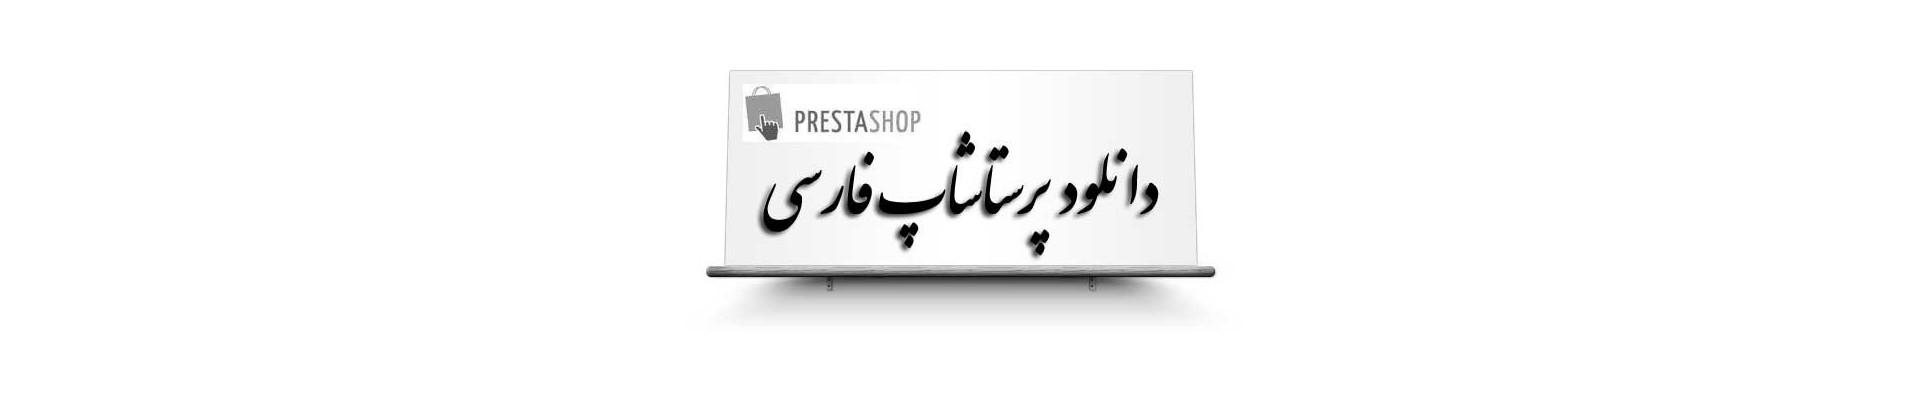 دانلود پرستاشاپ فارسی